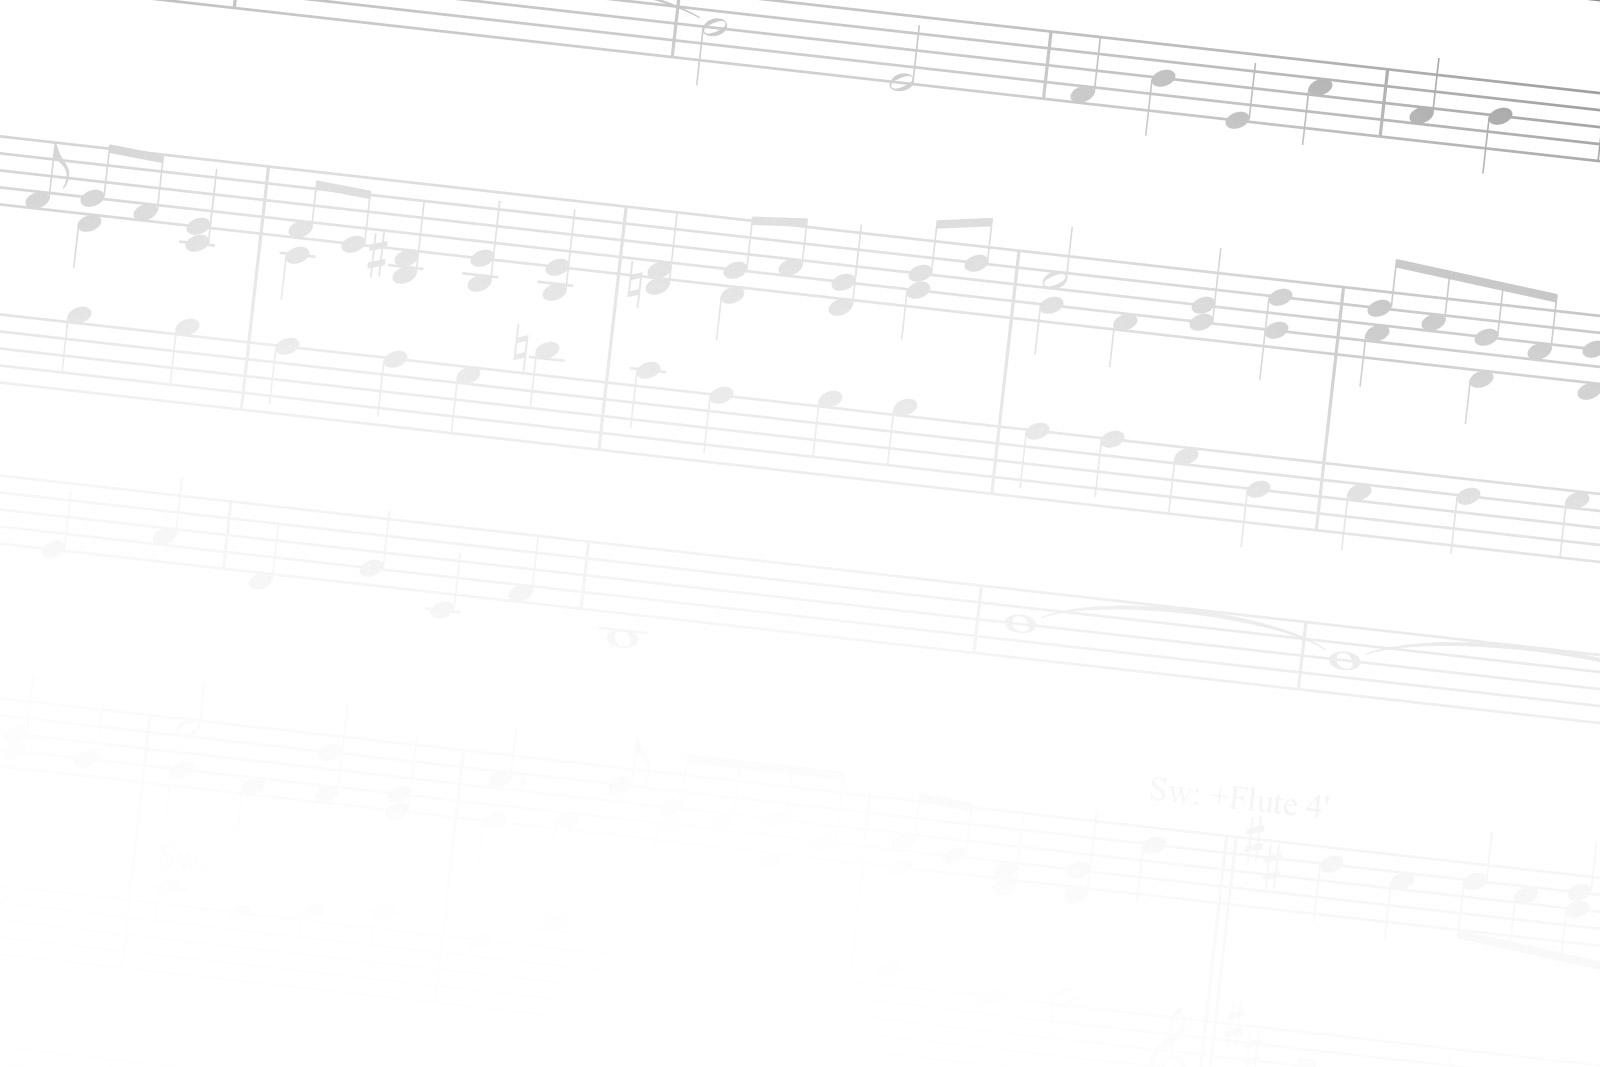 hymn-prelude-background-1.jpg